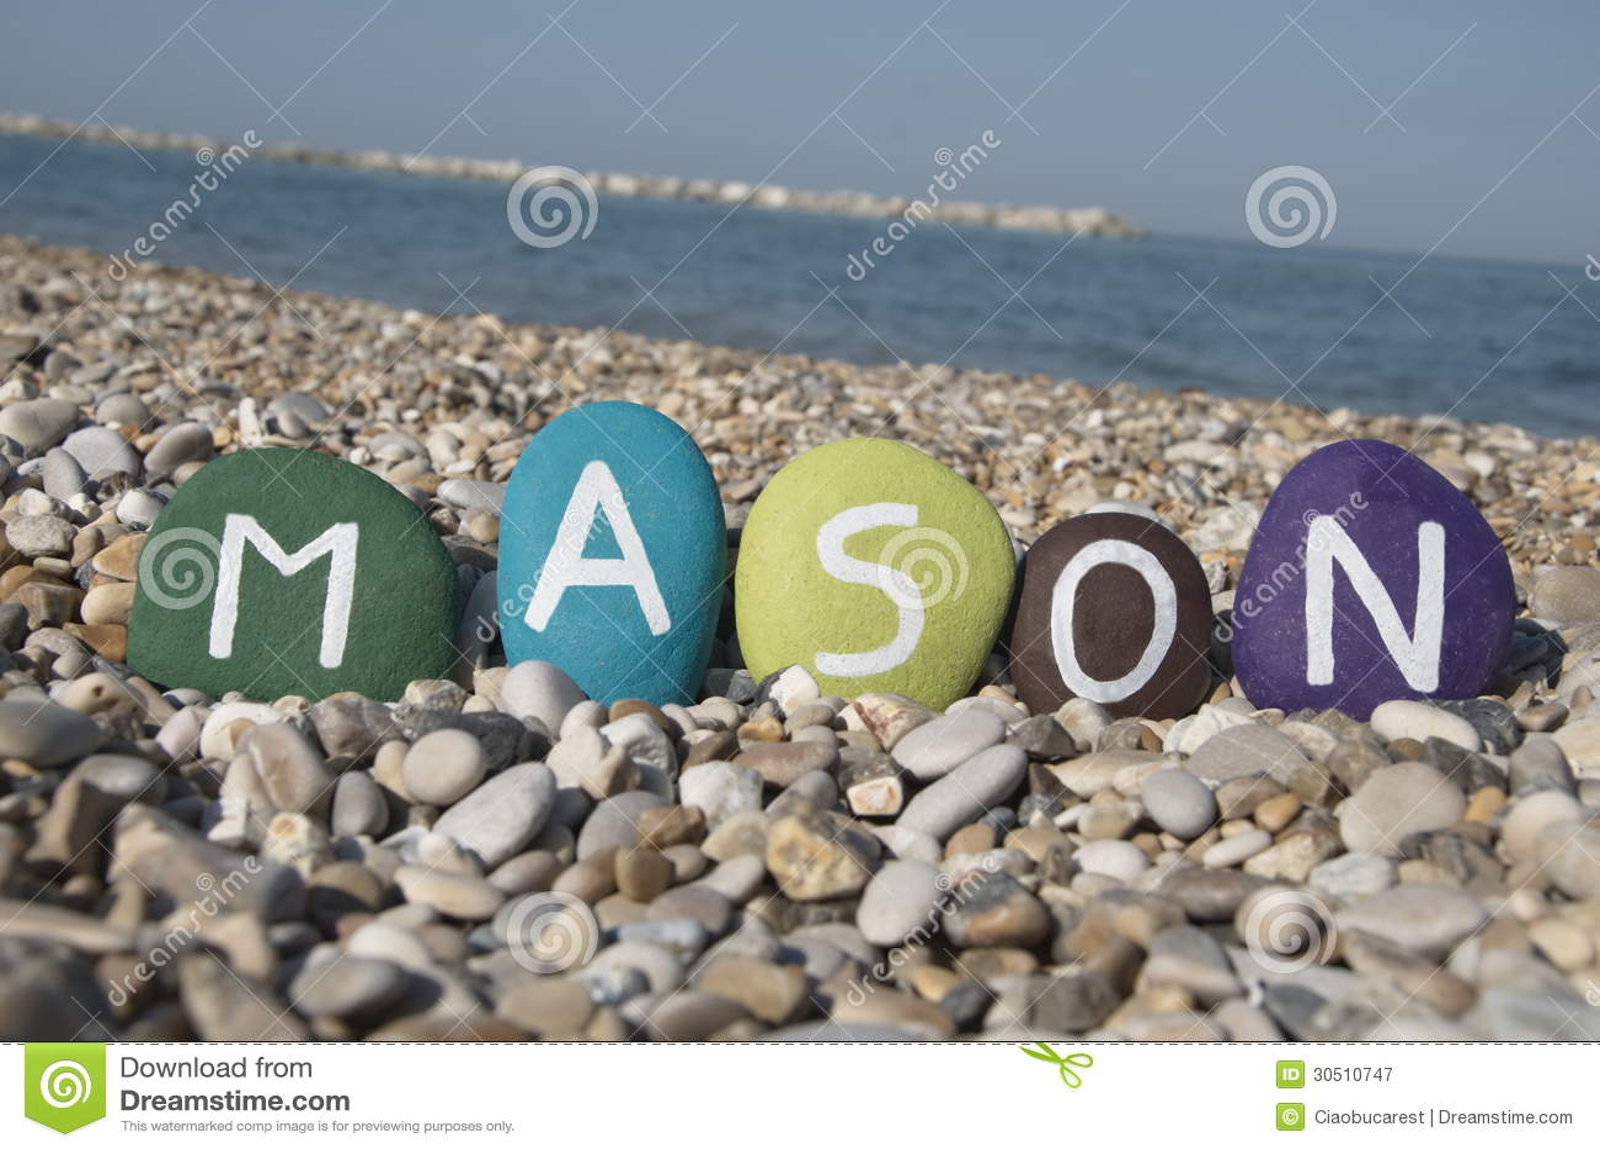 Mason, Male Name On Colourful Stones On Pebbles Stock Image ...